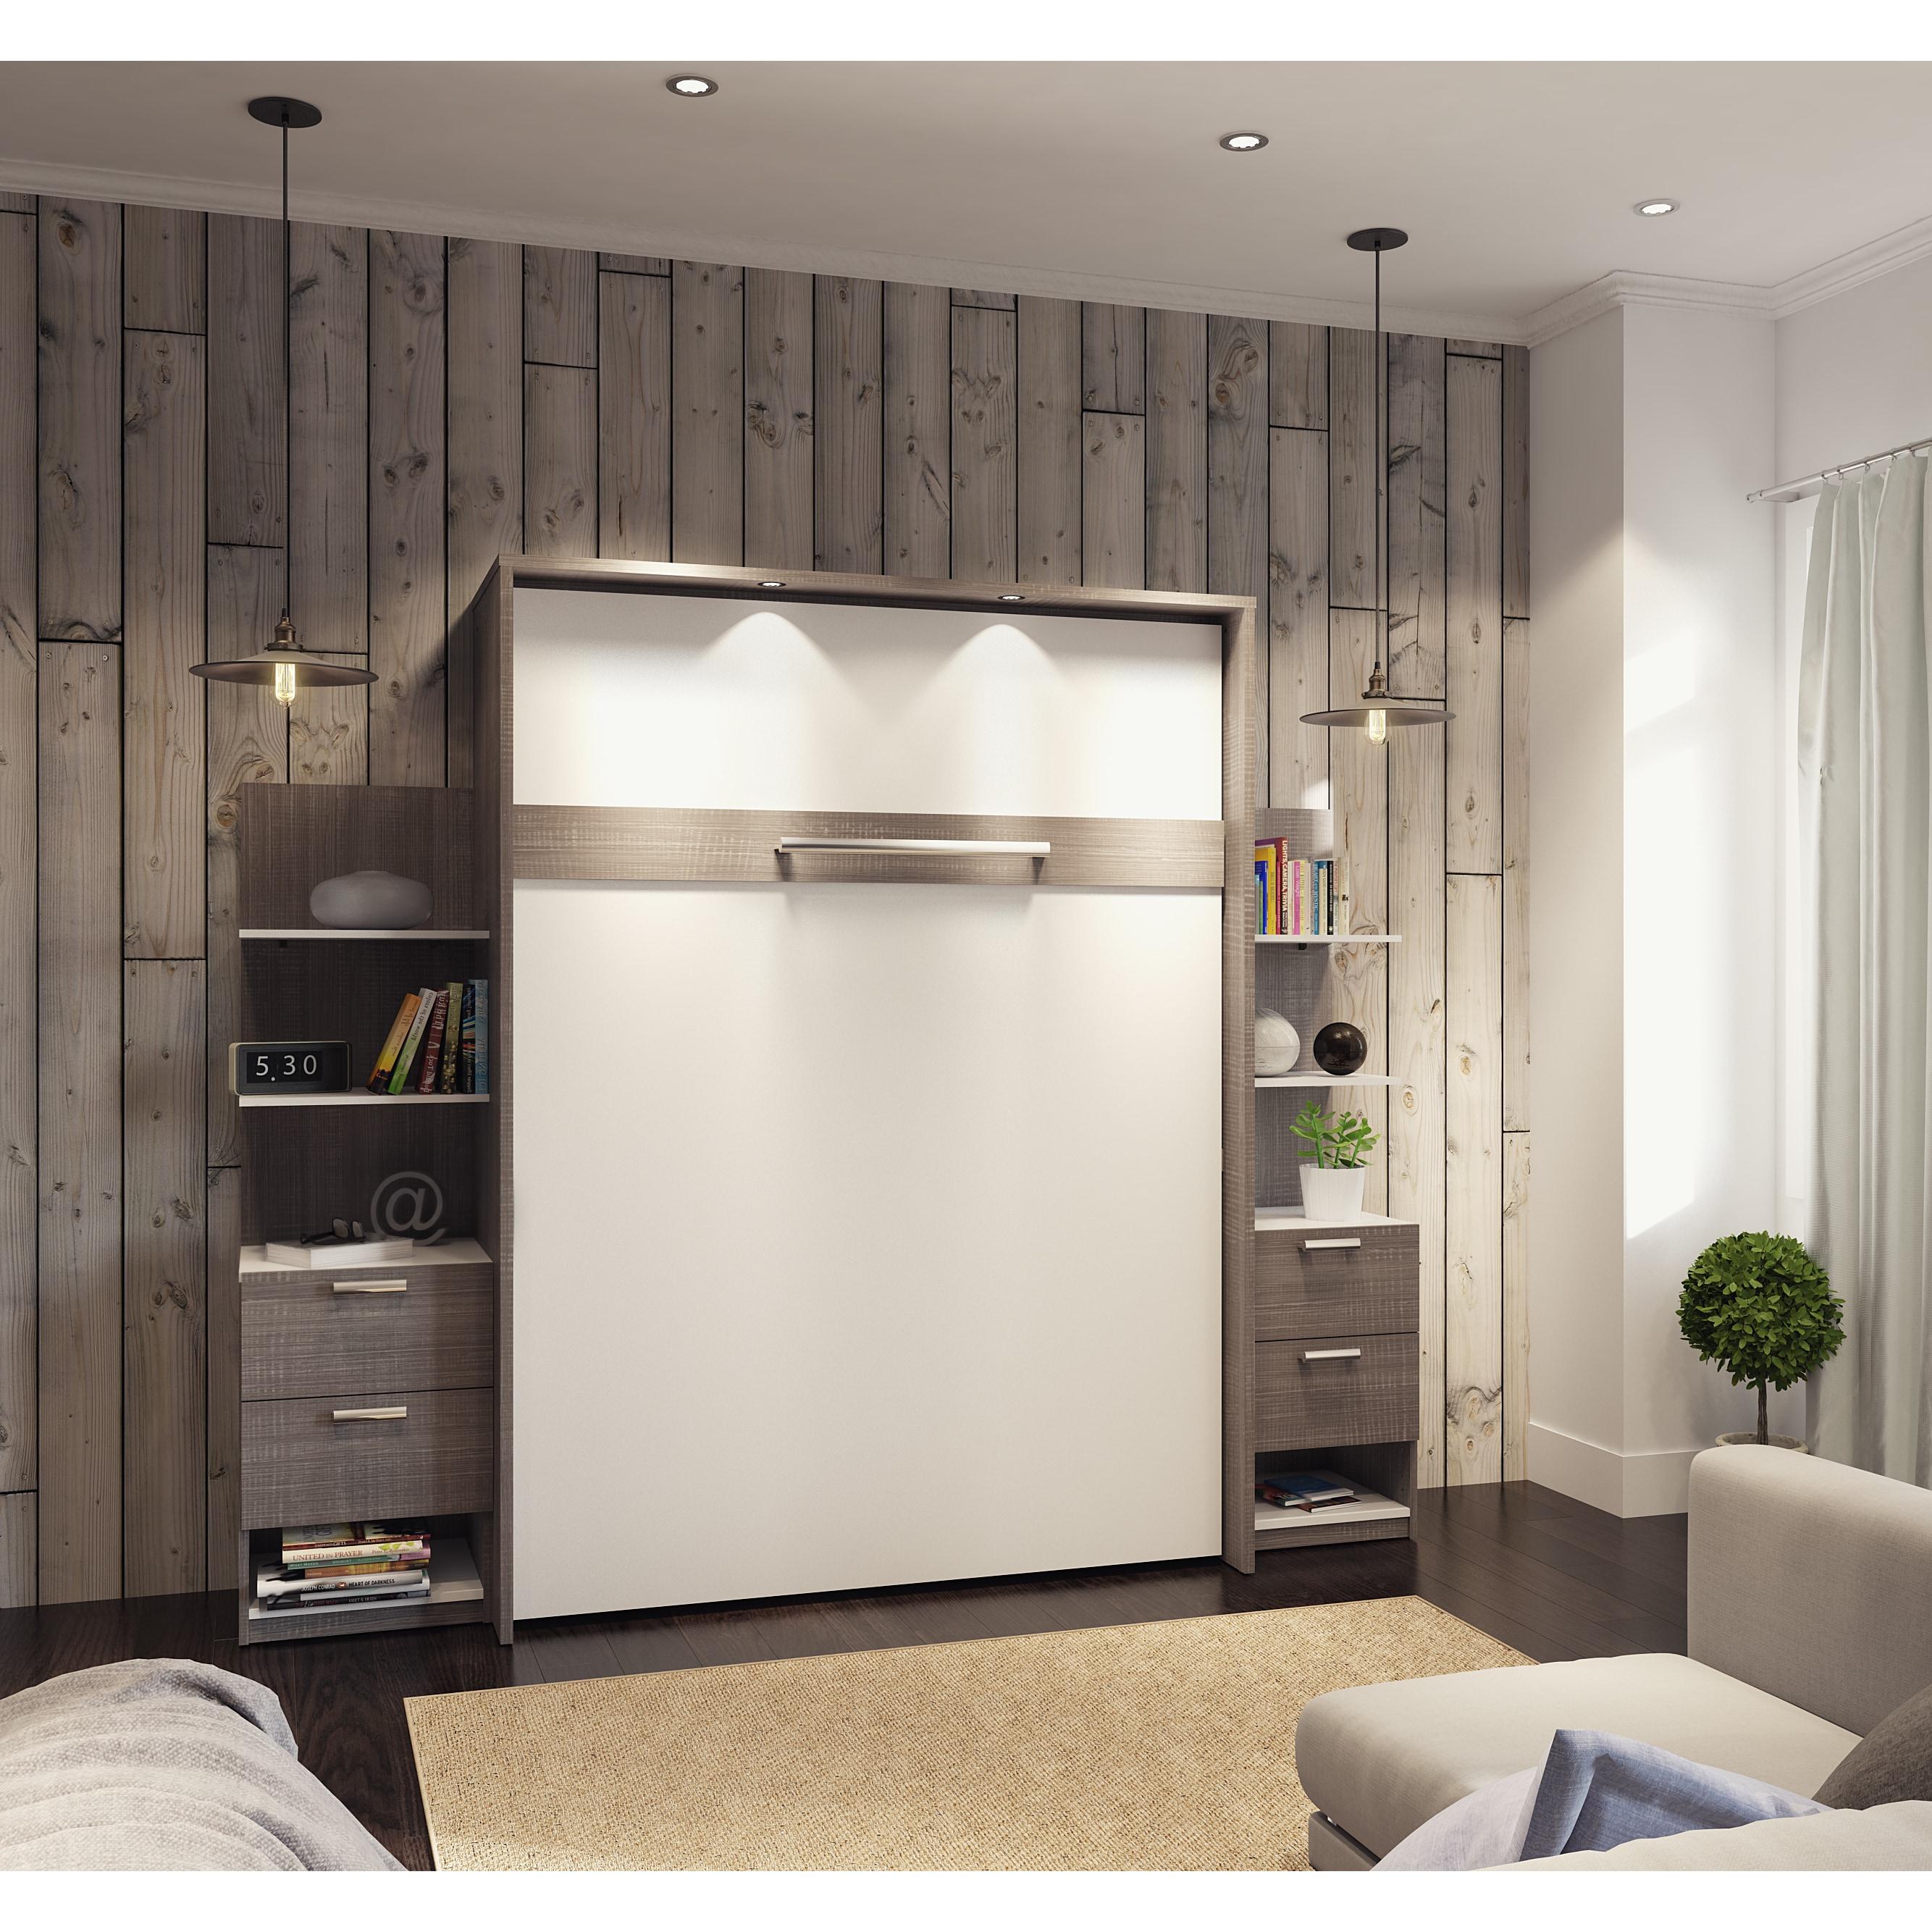 Shop Cielo By Bestar Elite 104 Inch Queen Wall Bed Kit Overstock 14086542